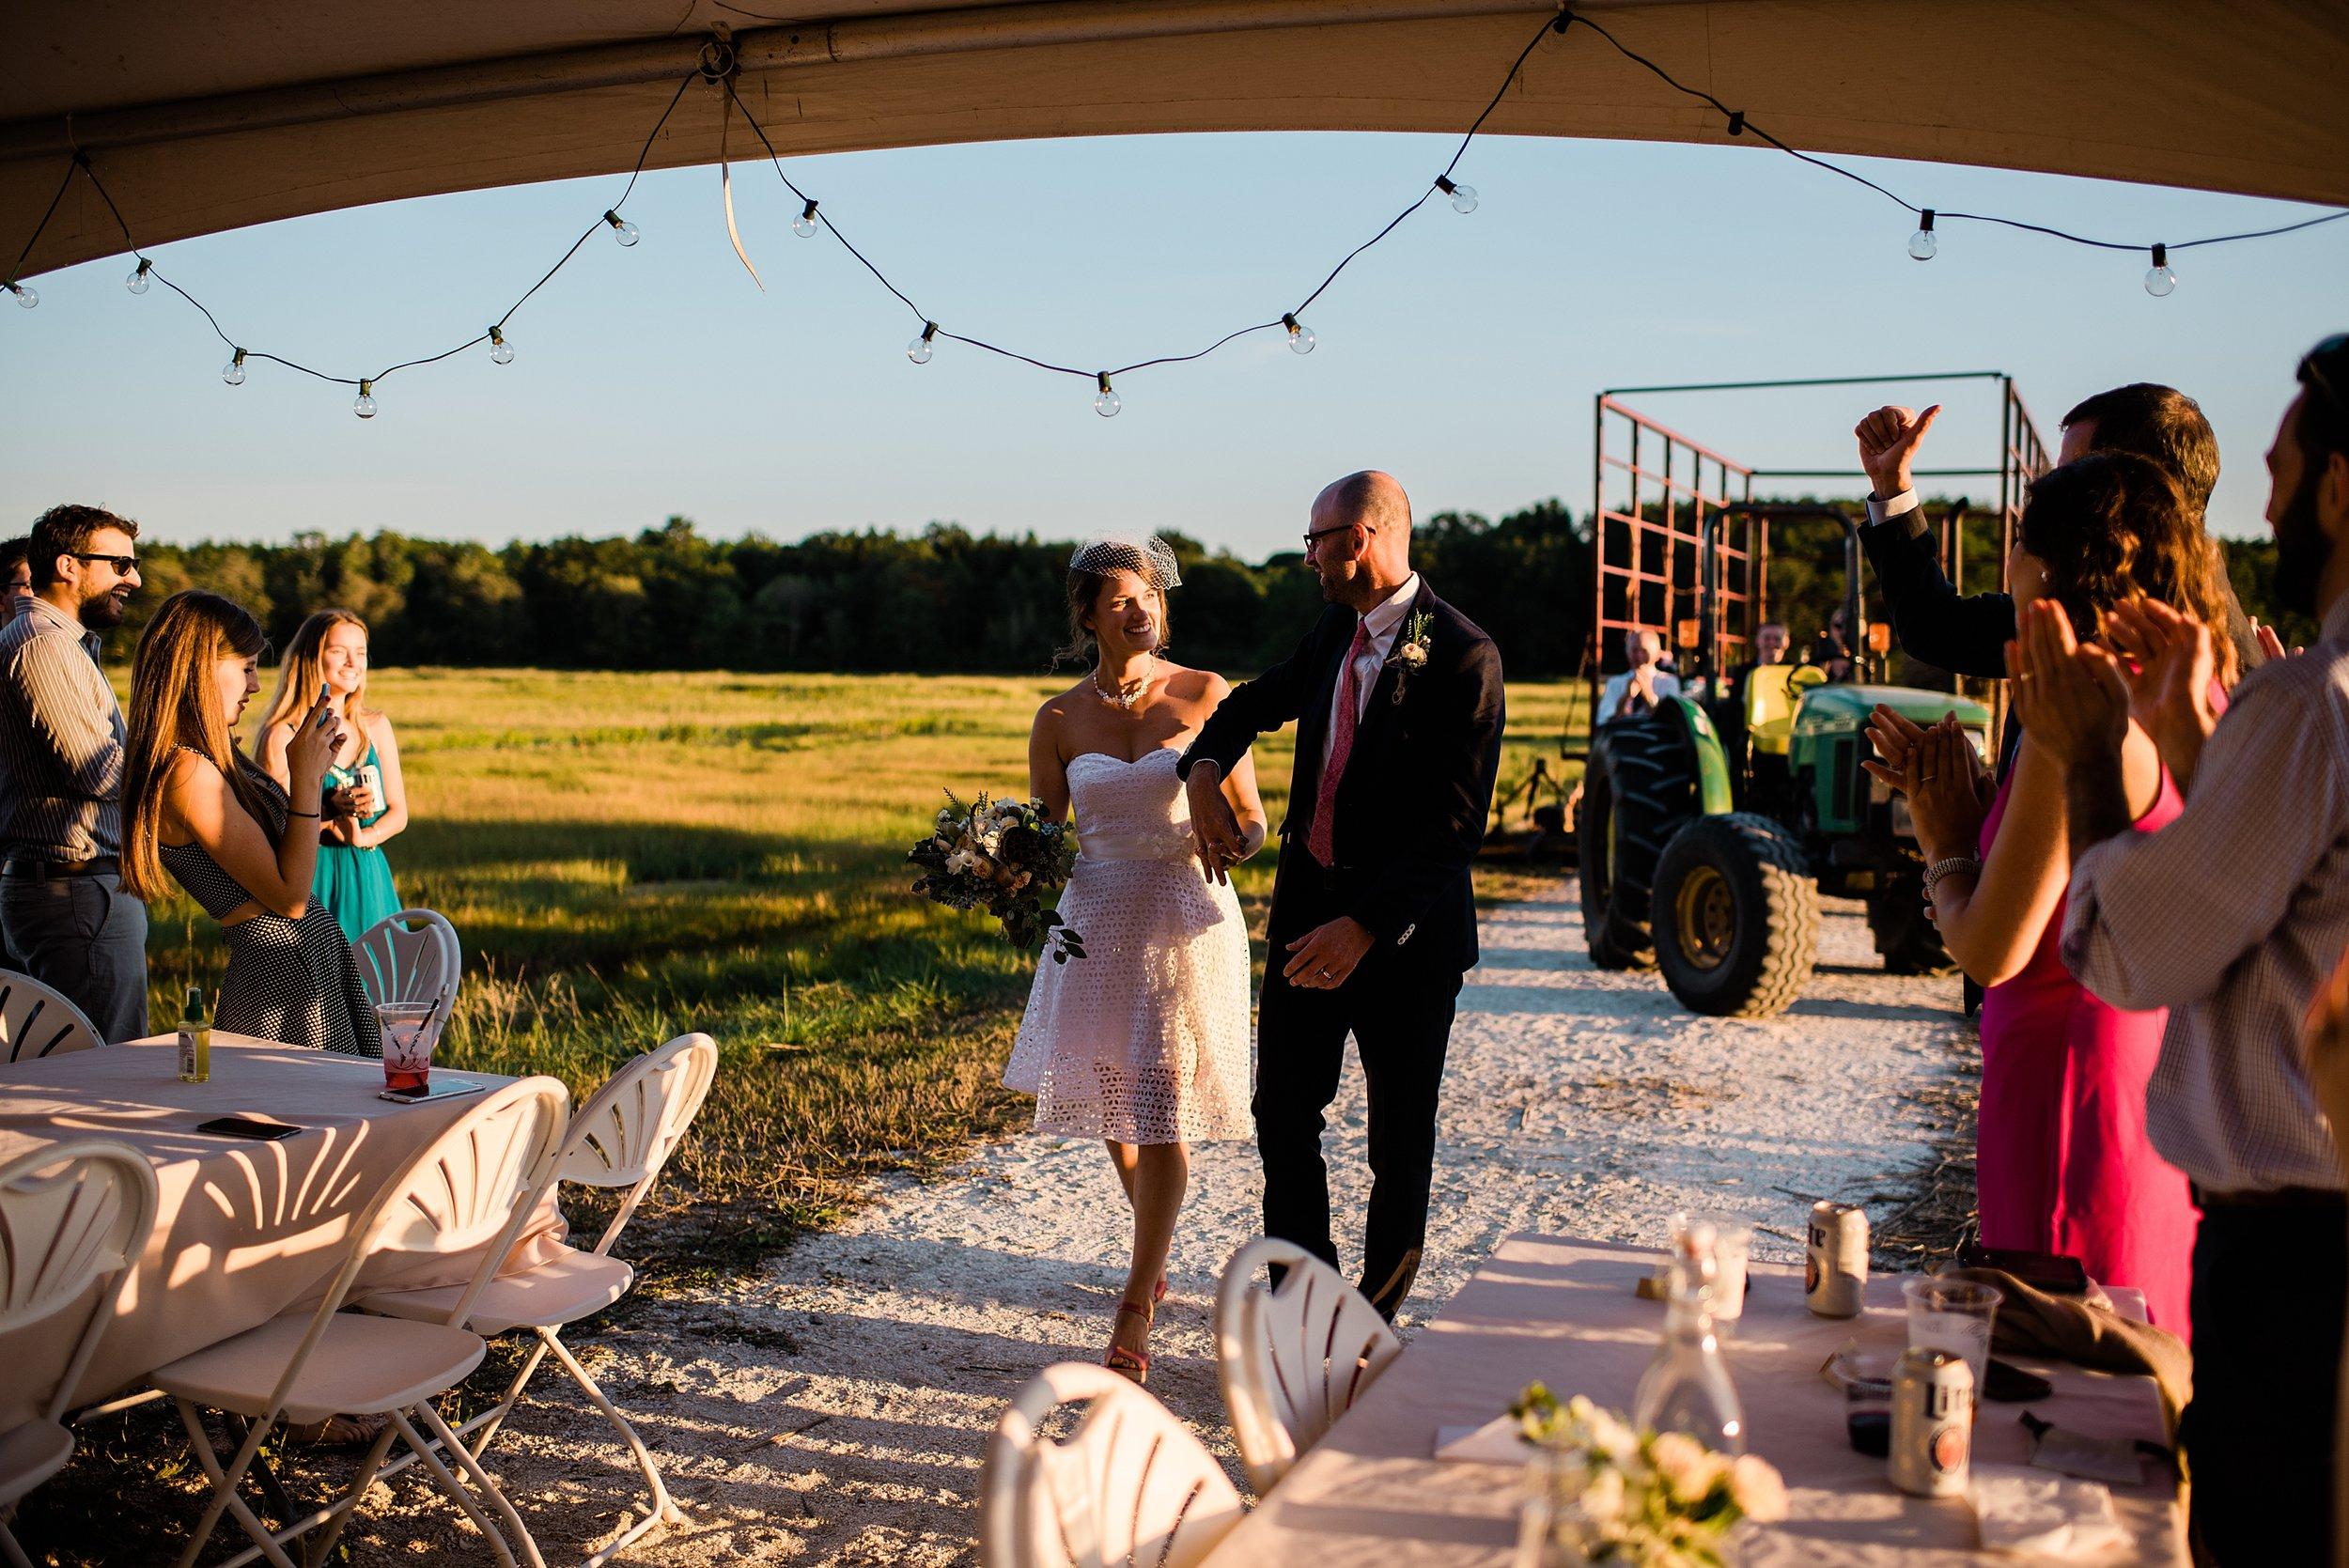 077 los angeles wedding photographer.jpg